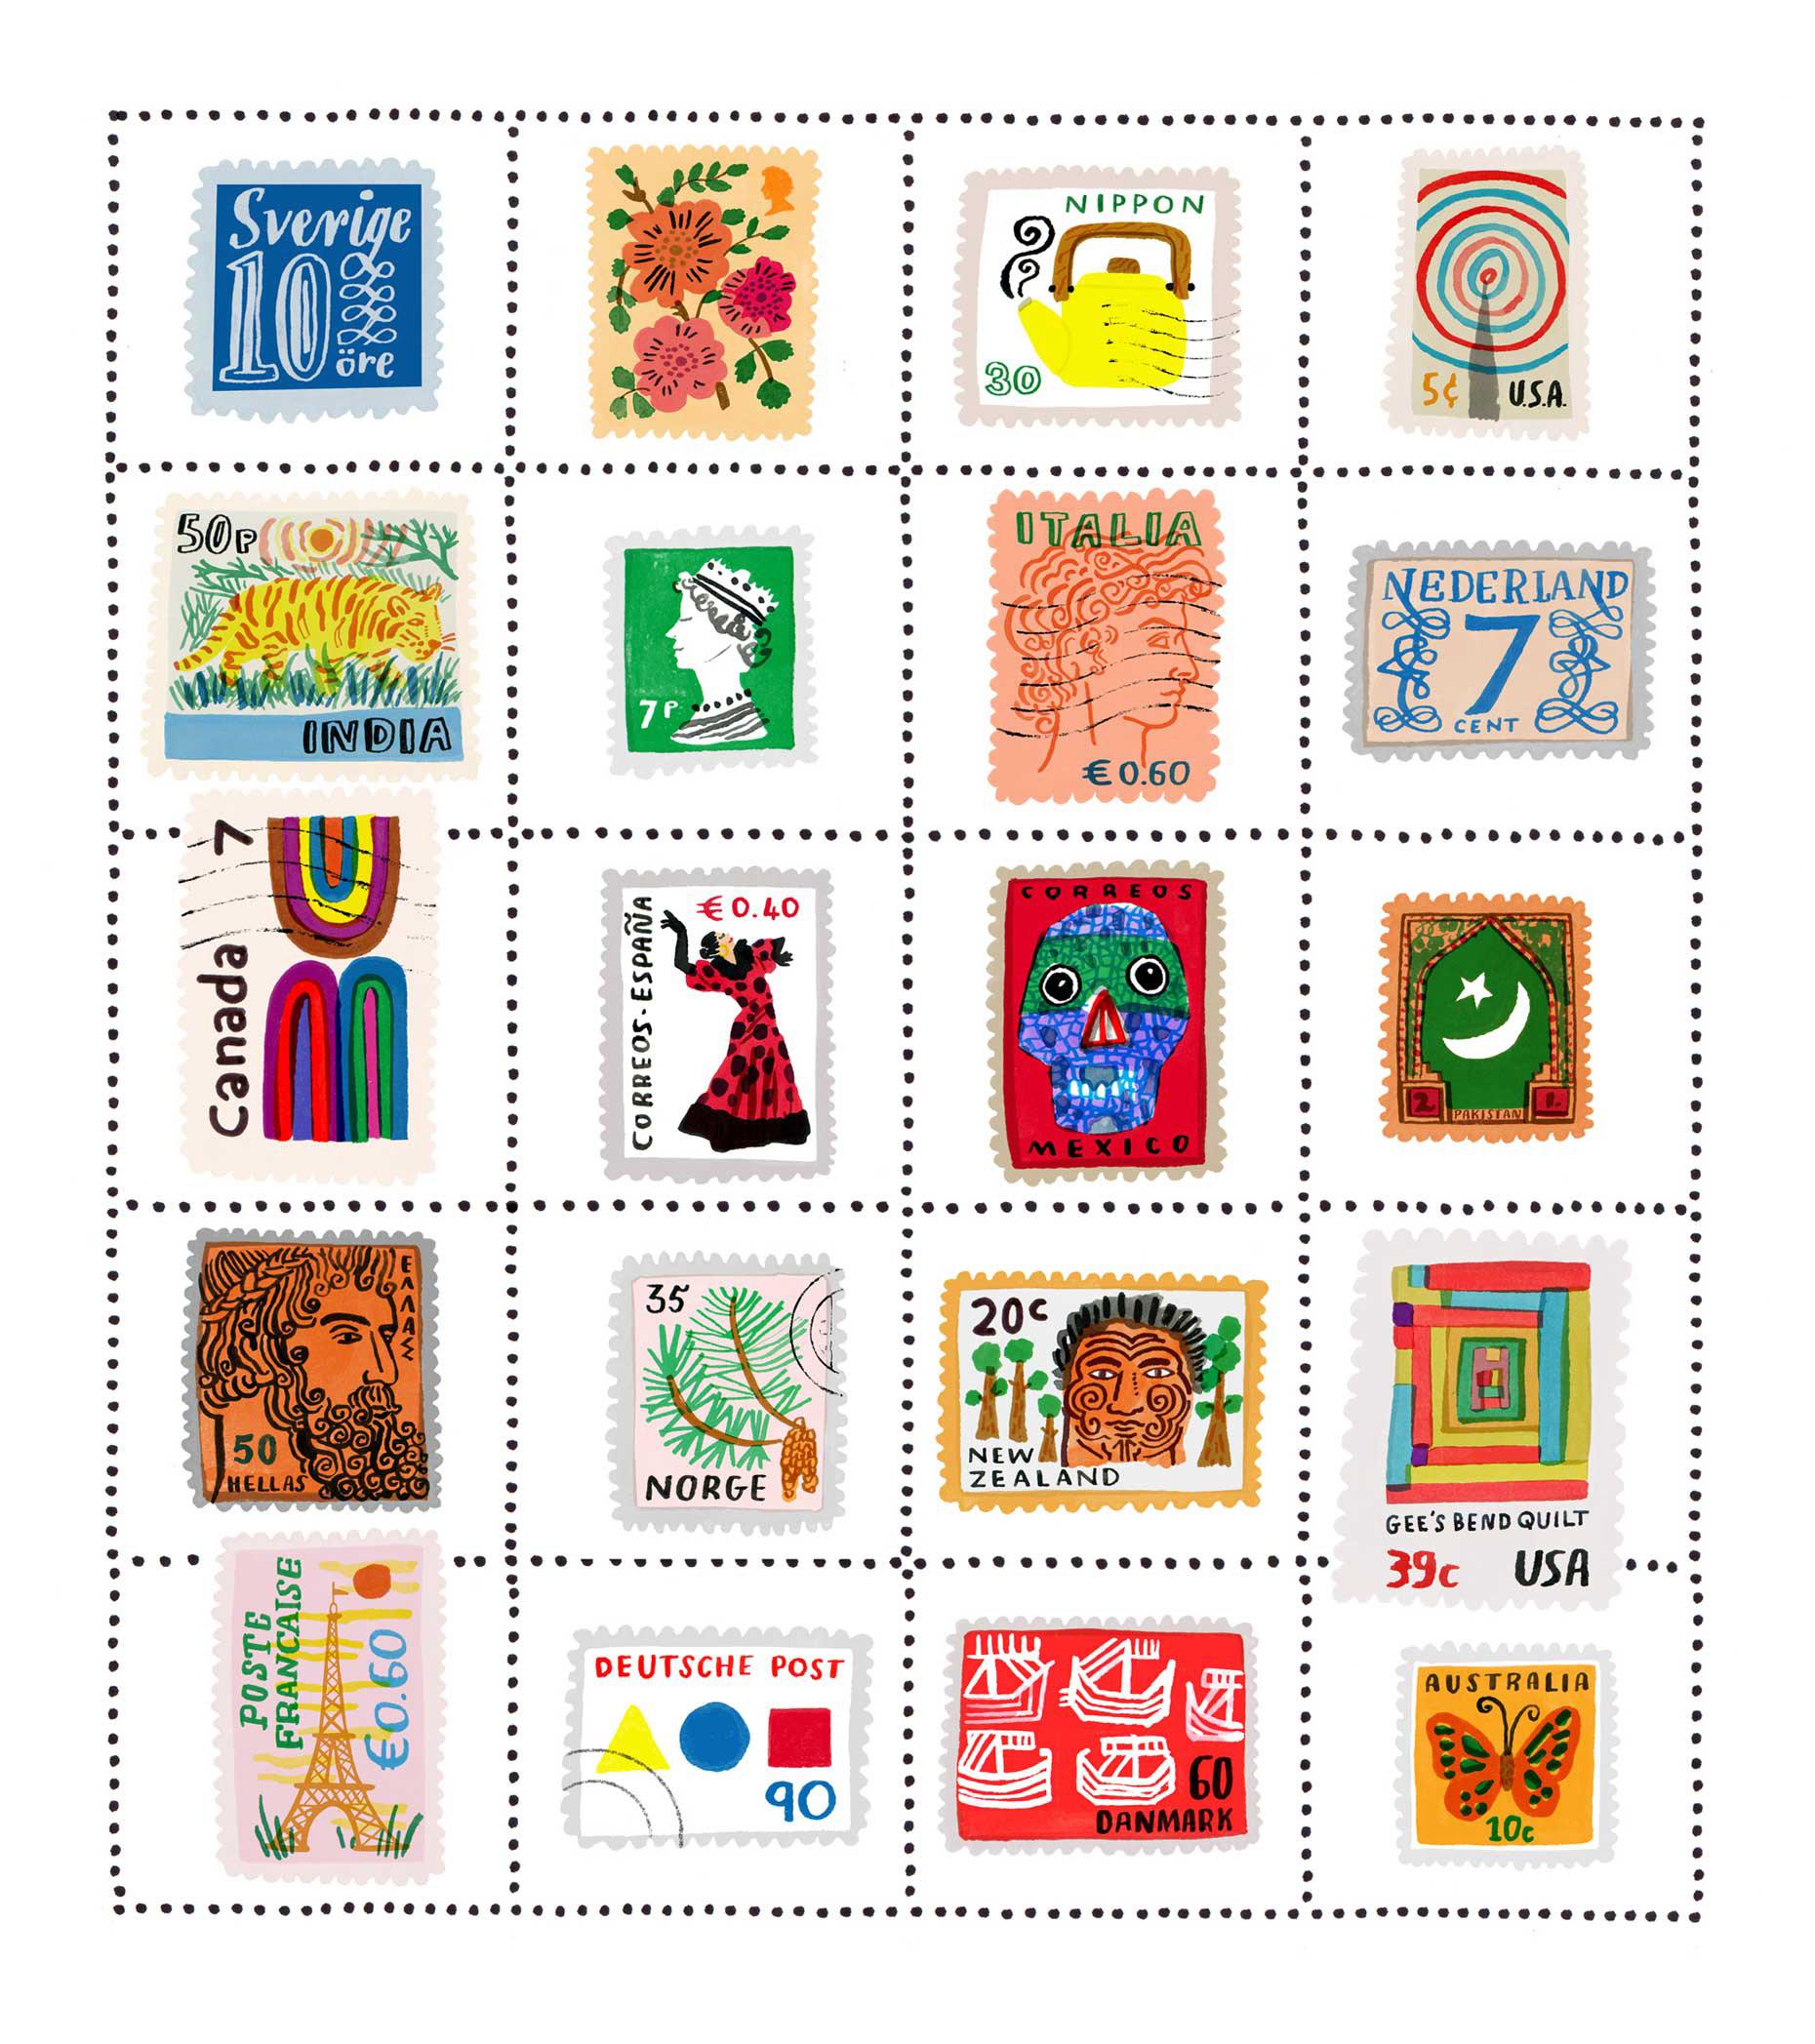 stamps_1_flat.jpg